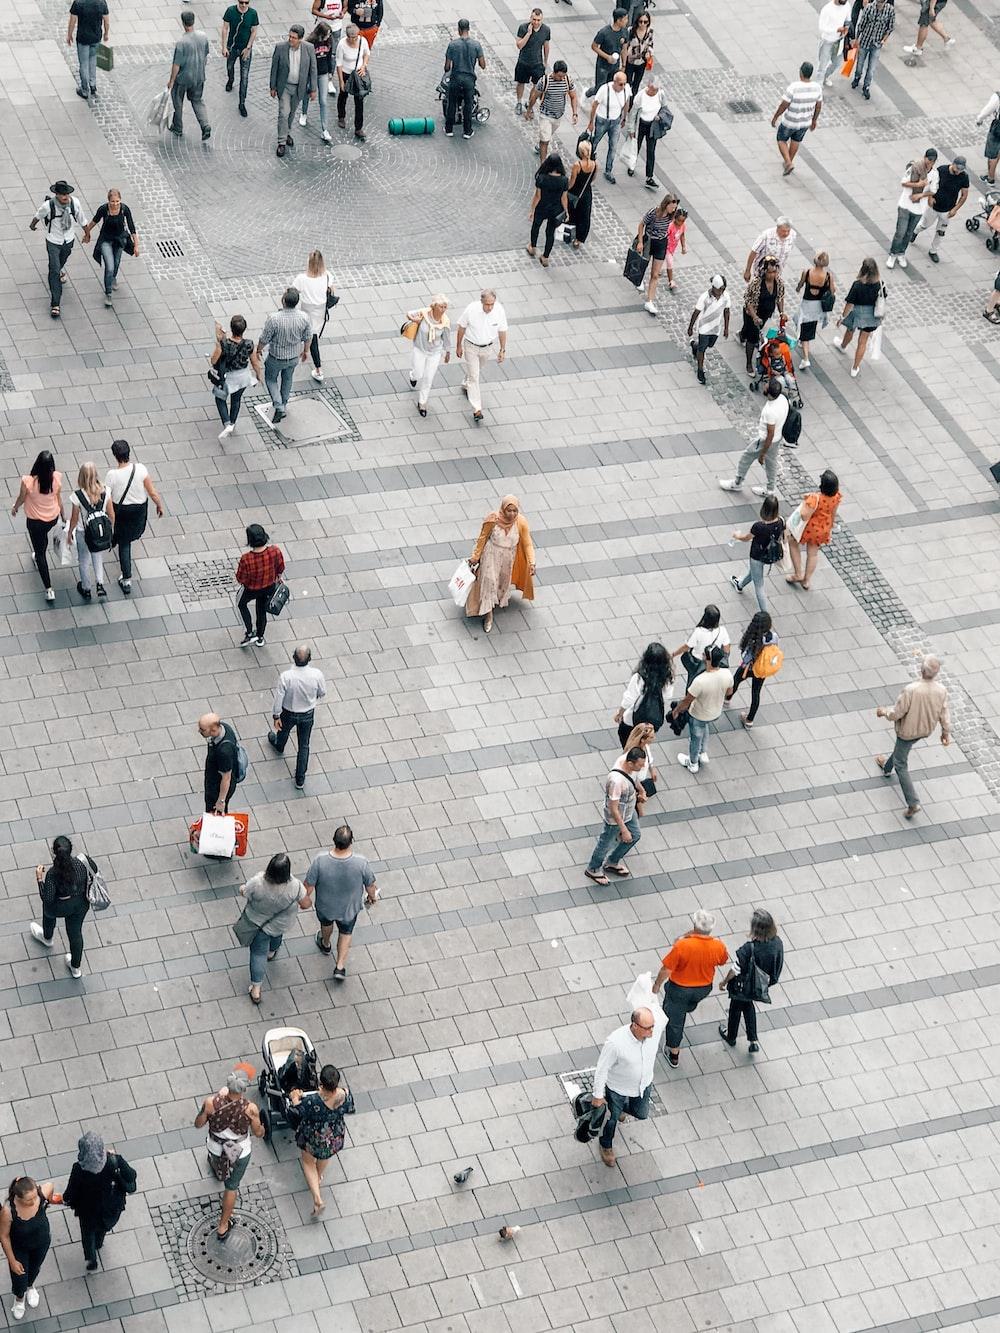 people walking on gray concrete road